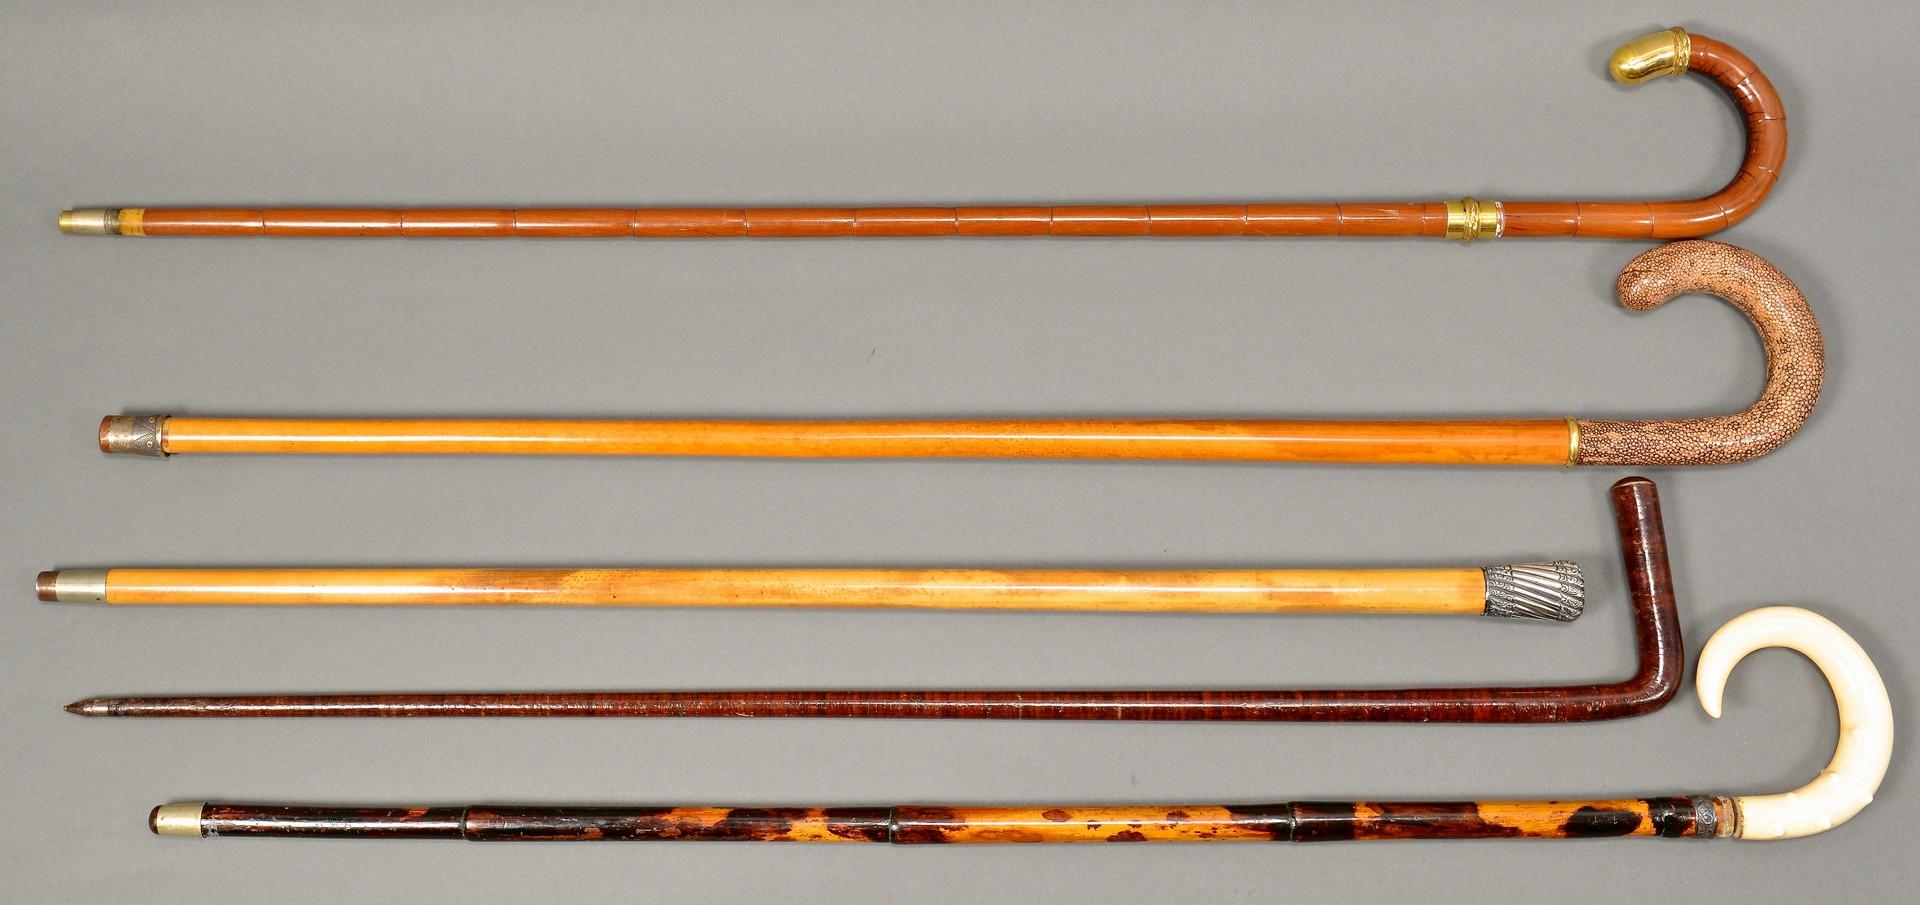 Lot 176: 5 Gentleman's Walking Sticks